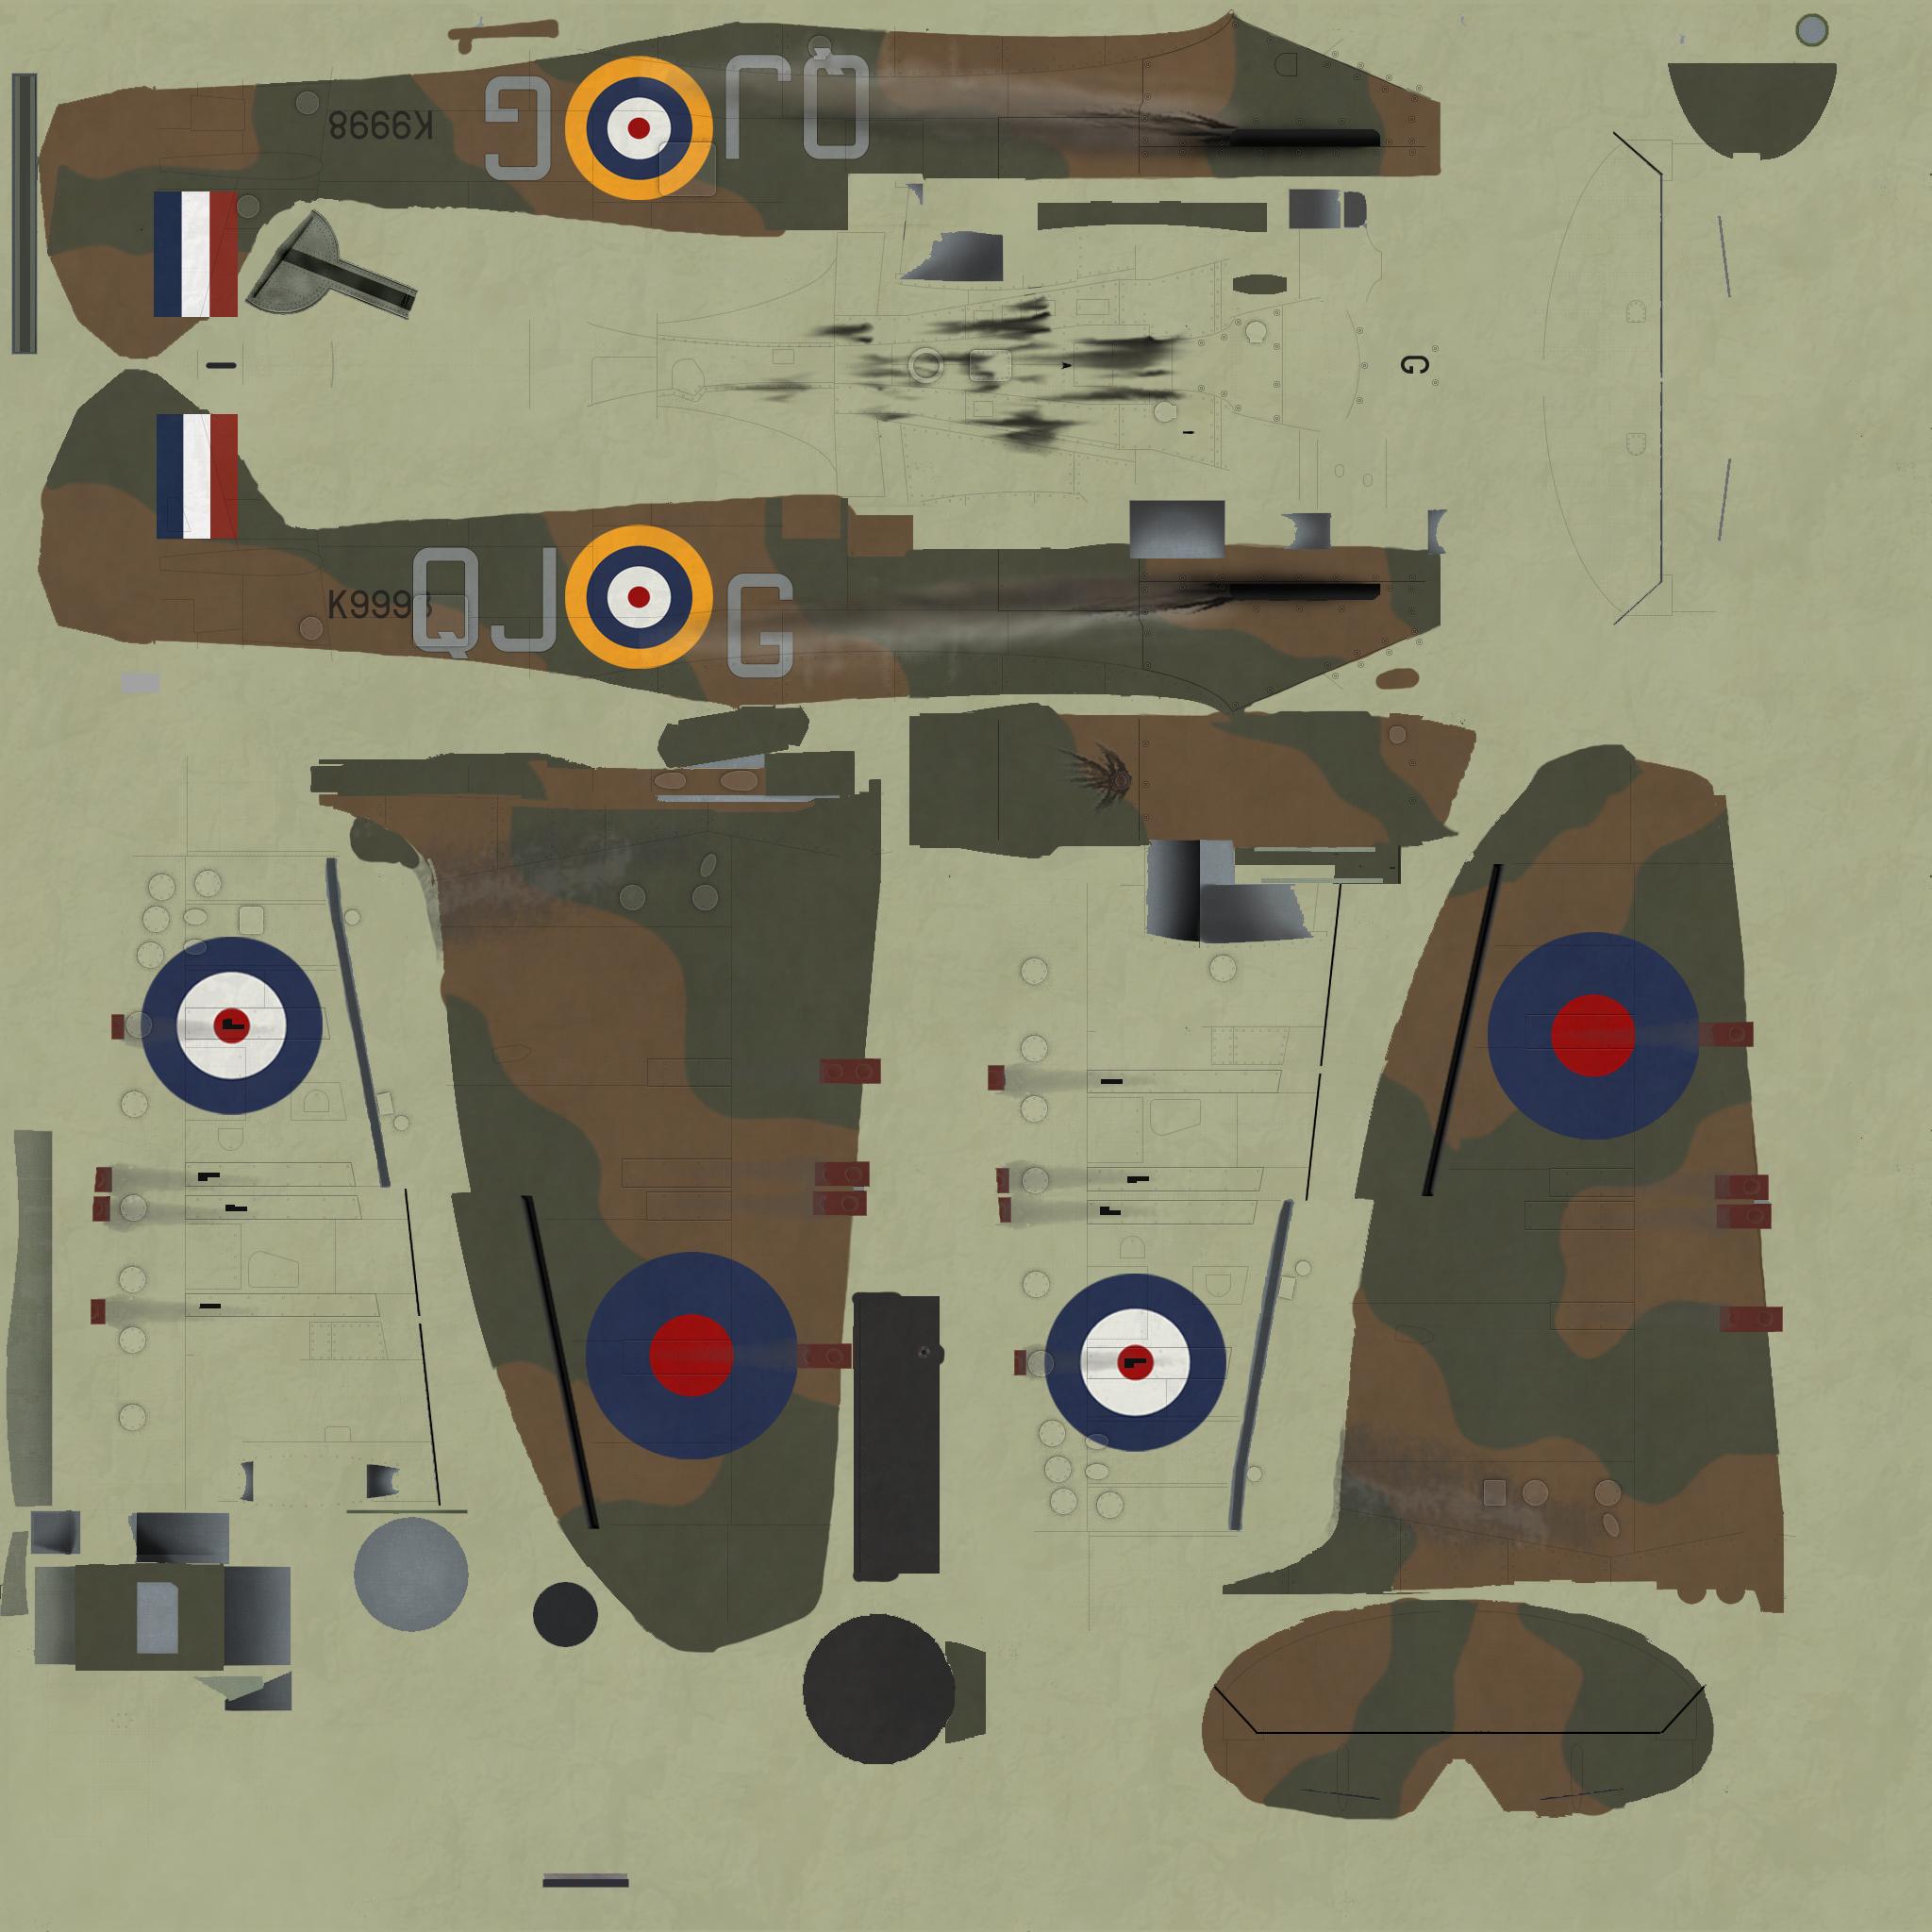 COD KF MKIa RAF 92Sqn QJG Geoffrey Wellum K9998 Pembrey 1940